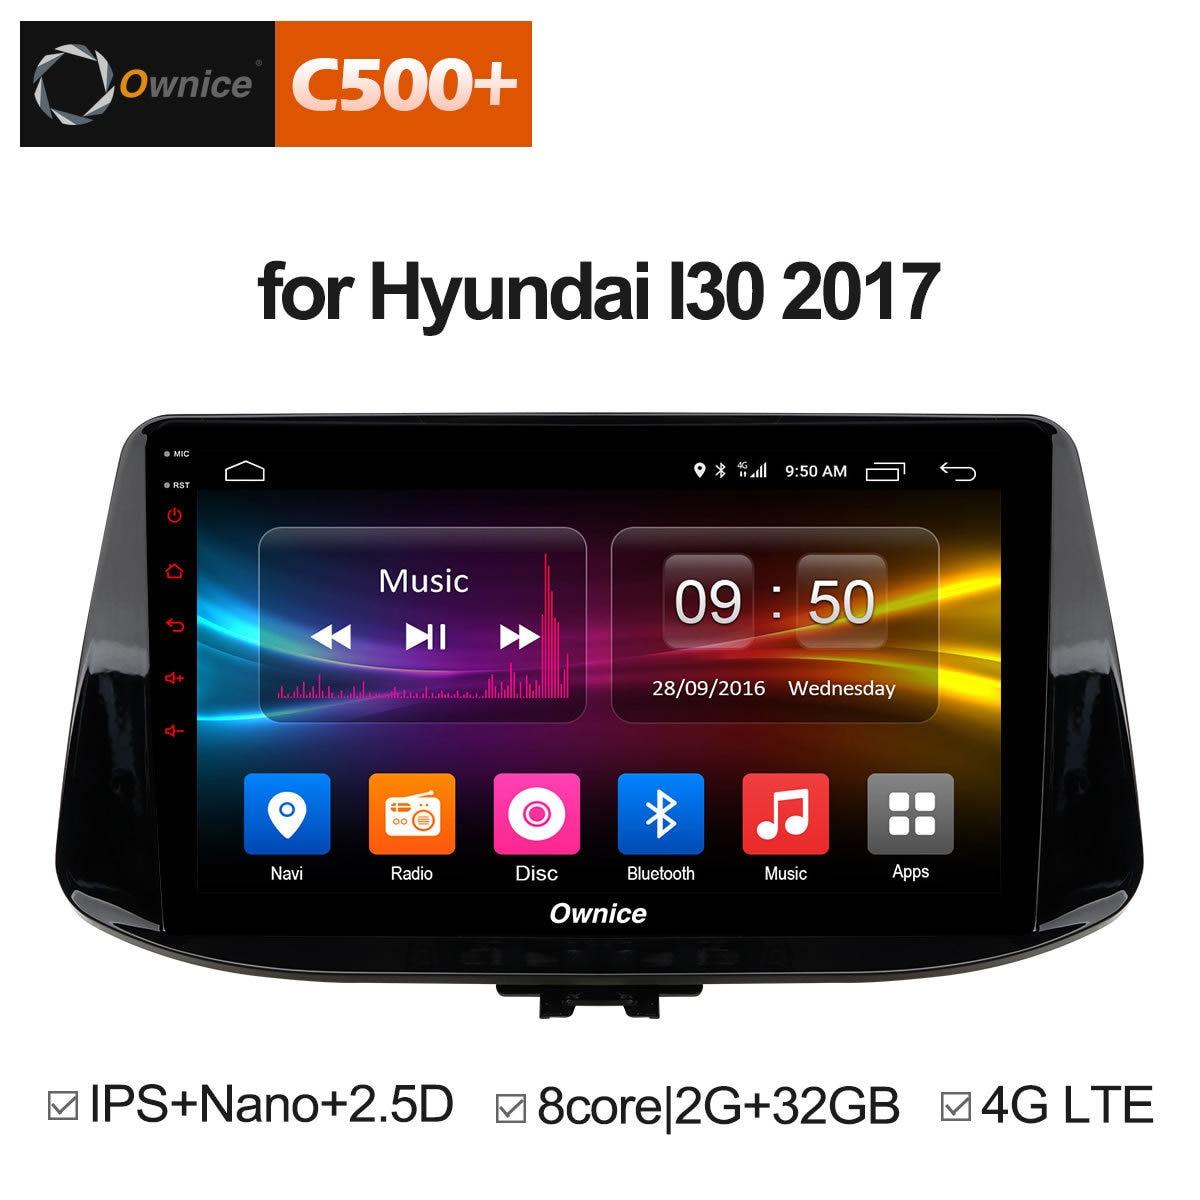 Ownice C500 + G10 Octa Core RAM 2g 32g Android 8.1 für Hyundai i30 2017 2018 Auto DVD Player GPS Radio stereo Video kopf Einheit 4g